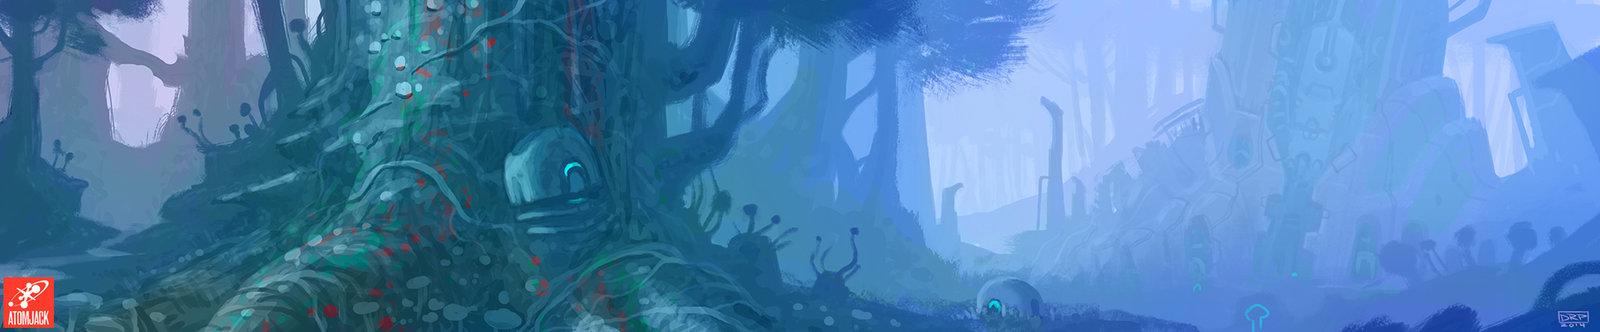 Twilight Forest Zone